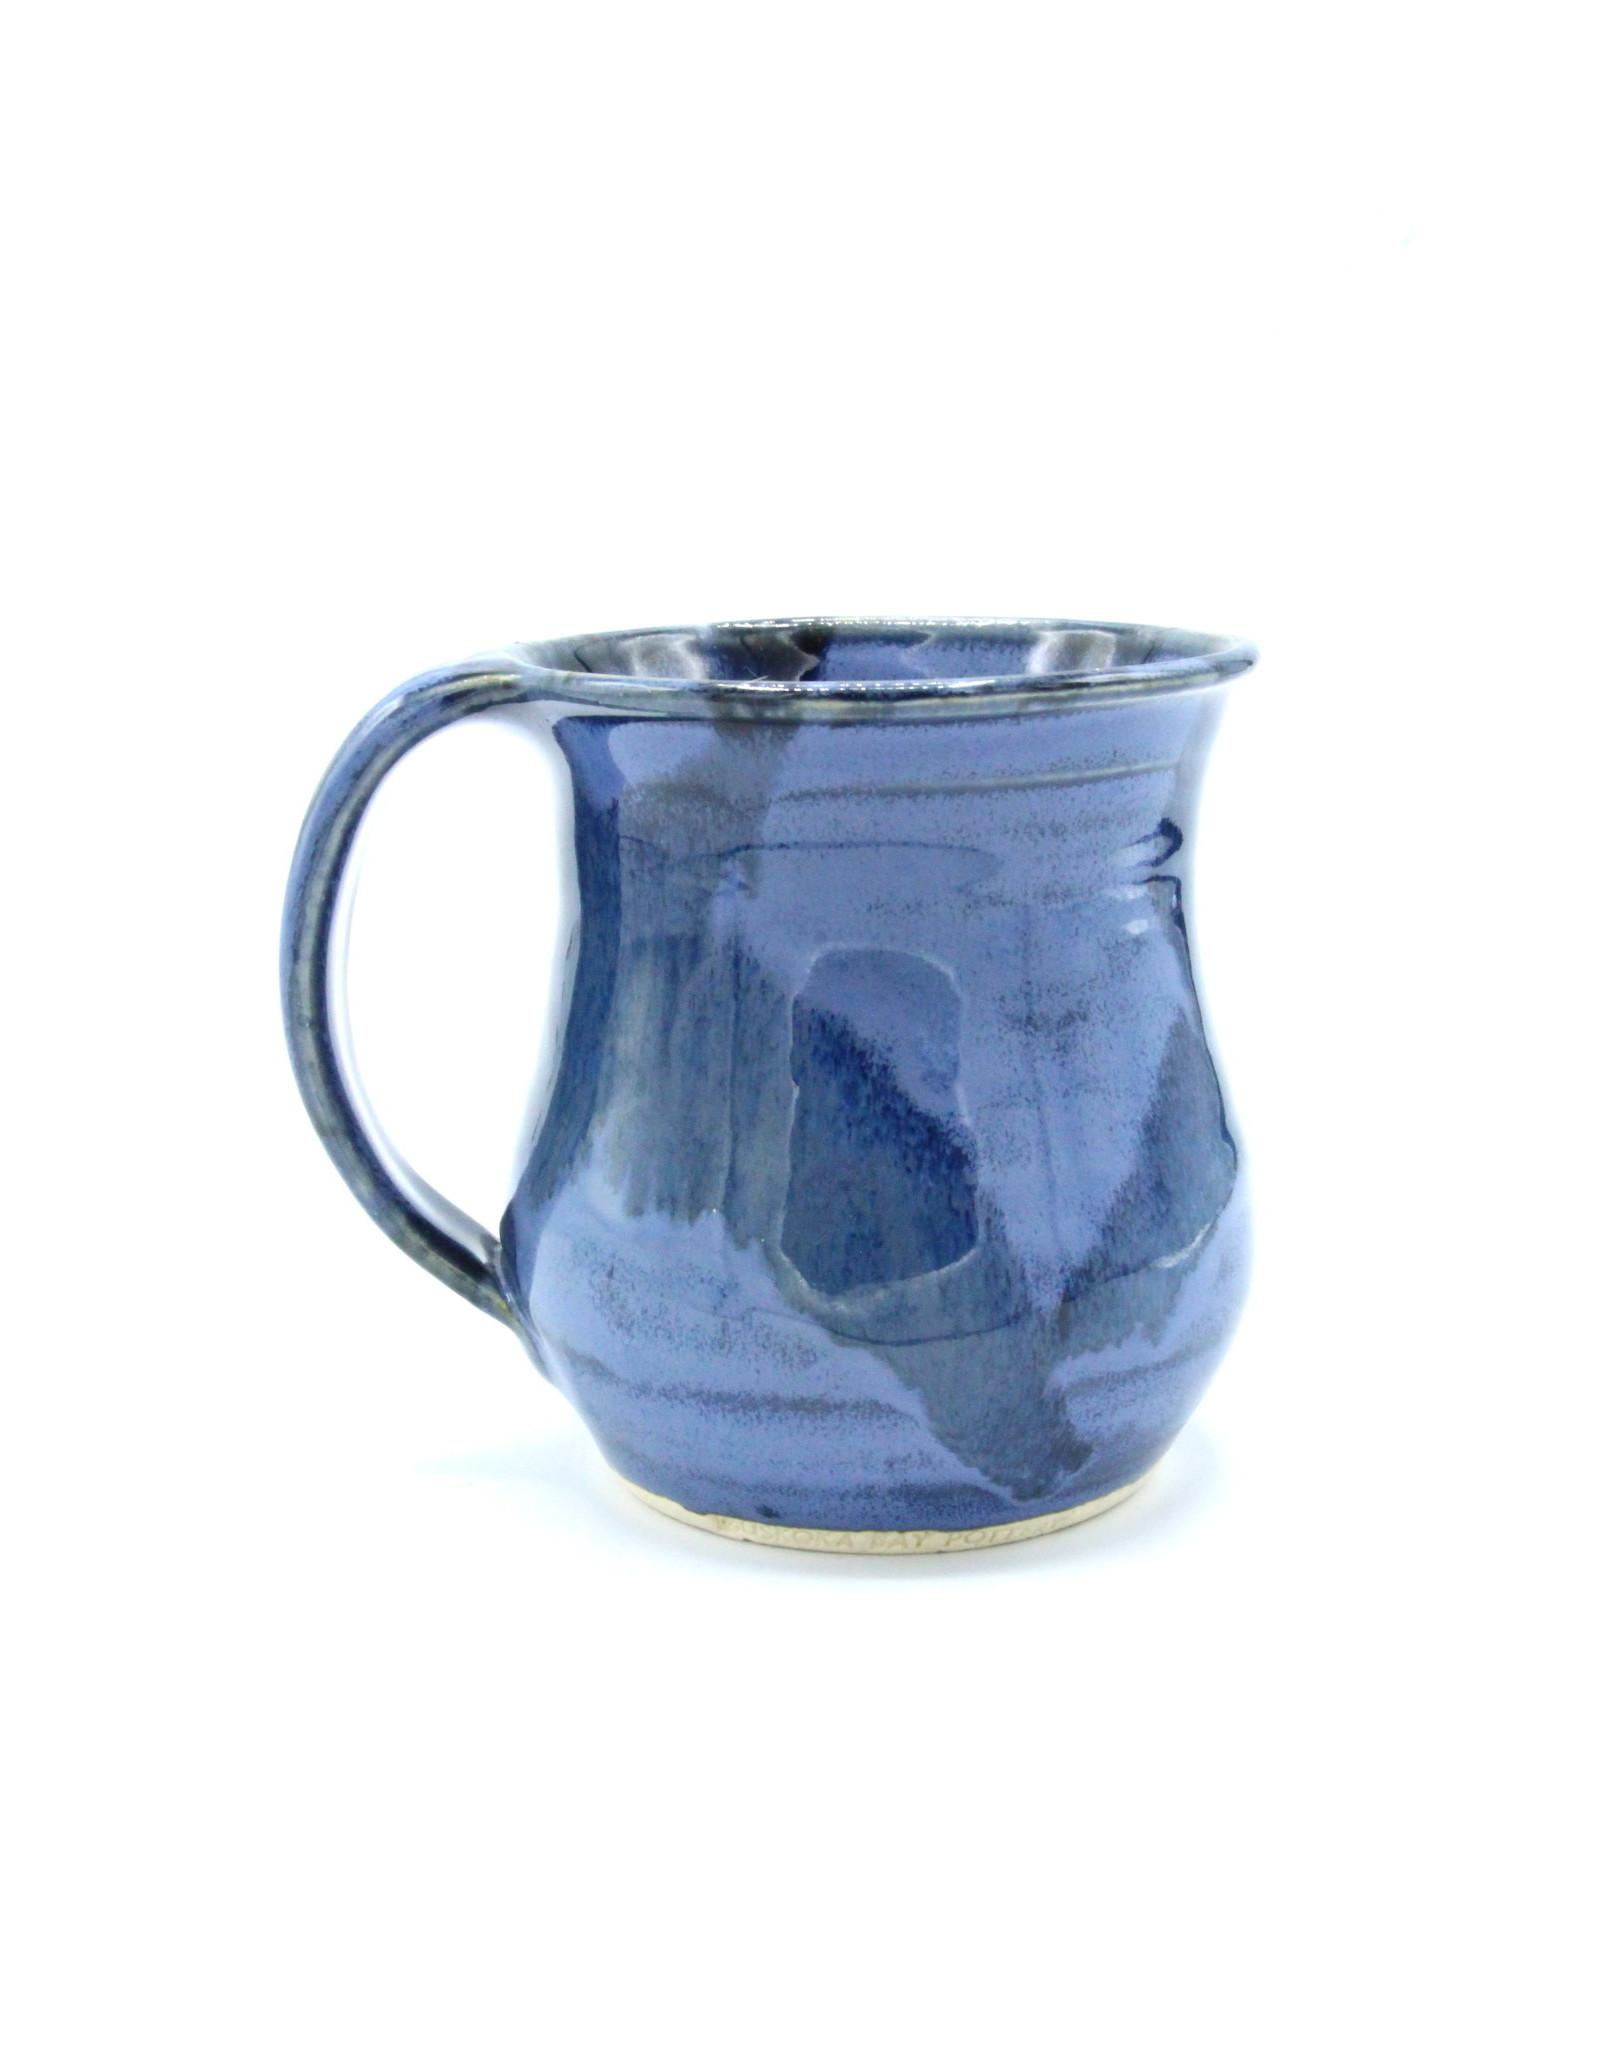 Potbelly Mug